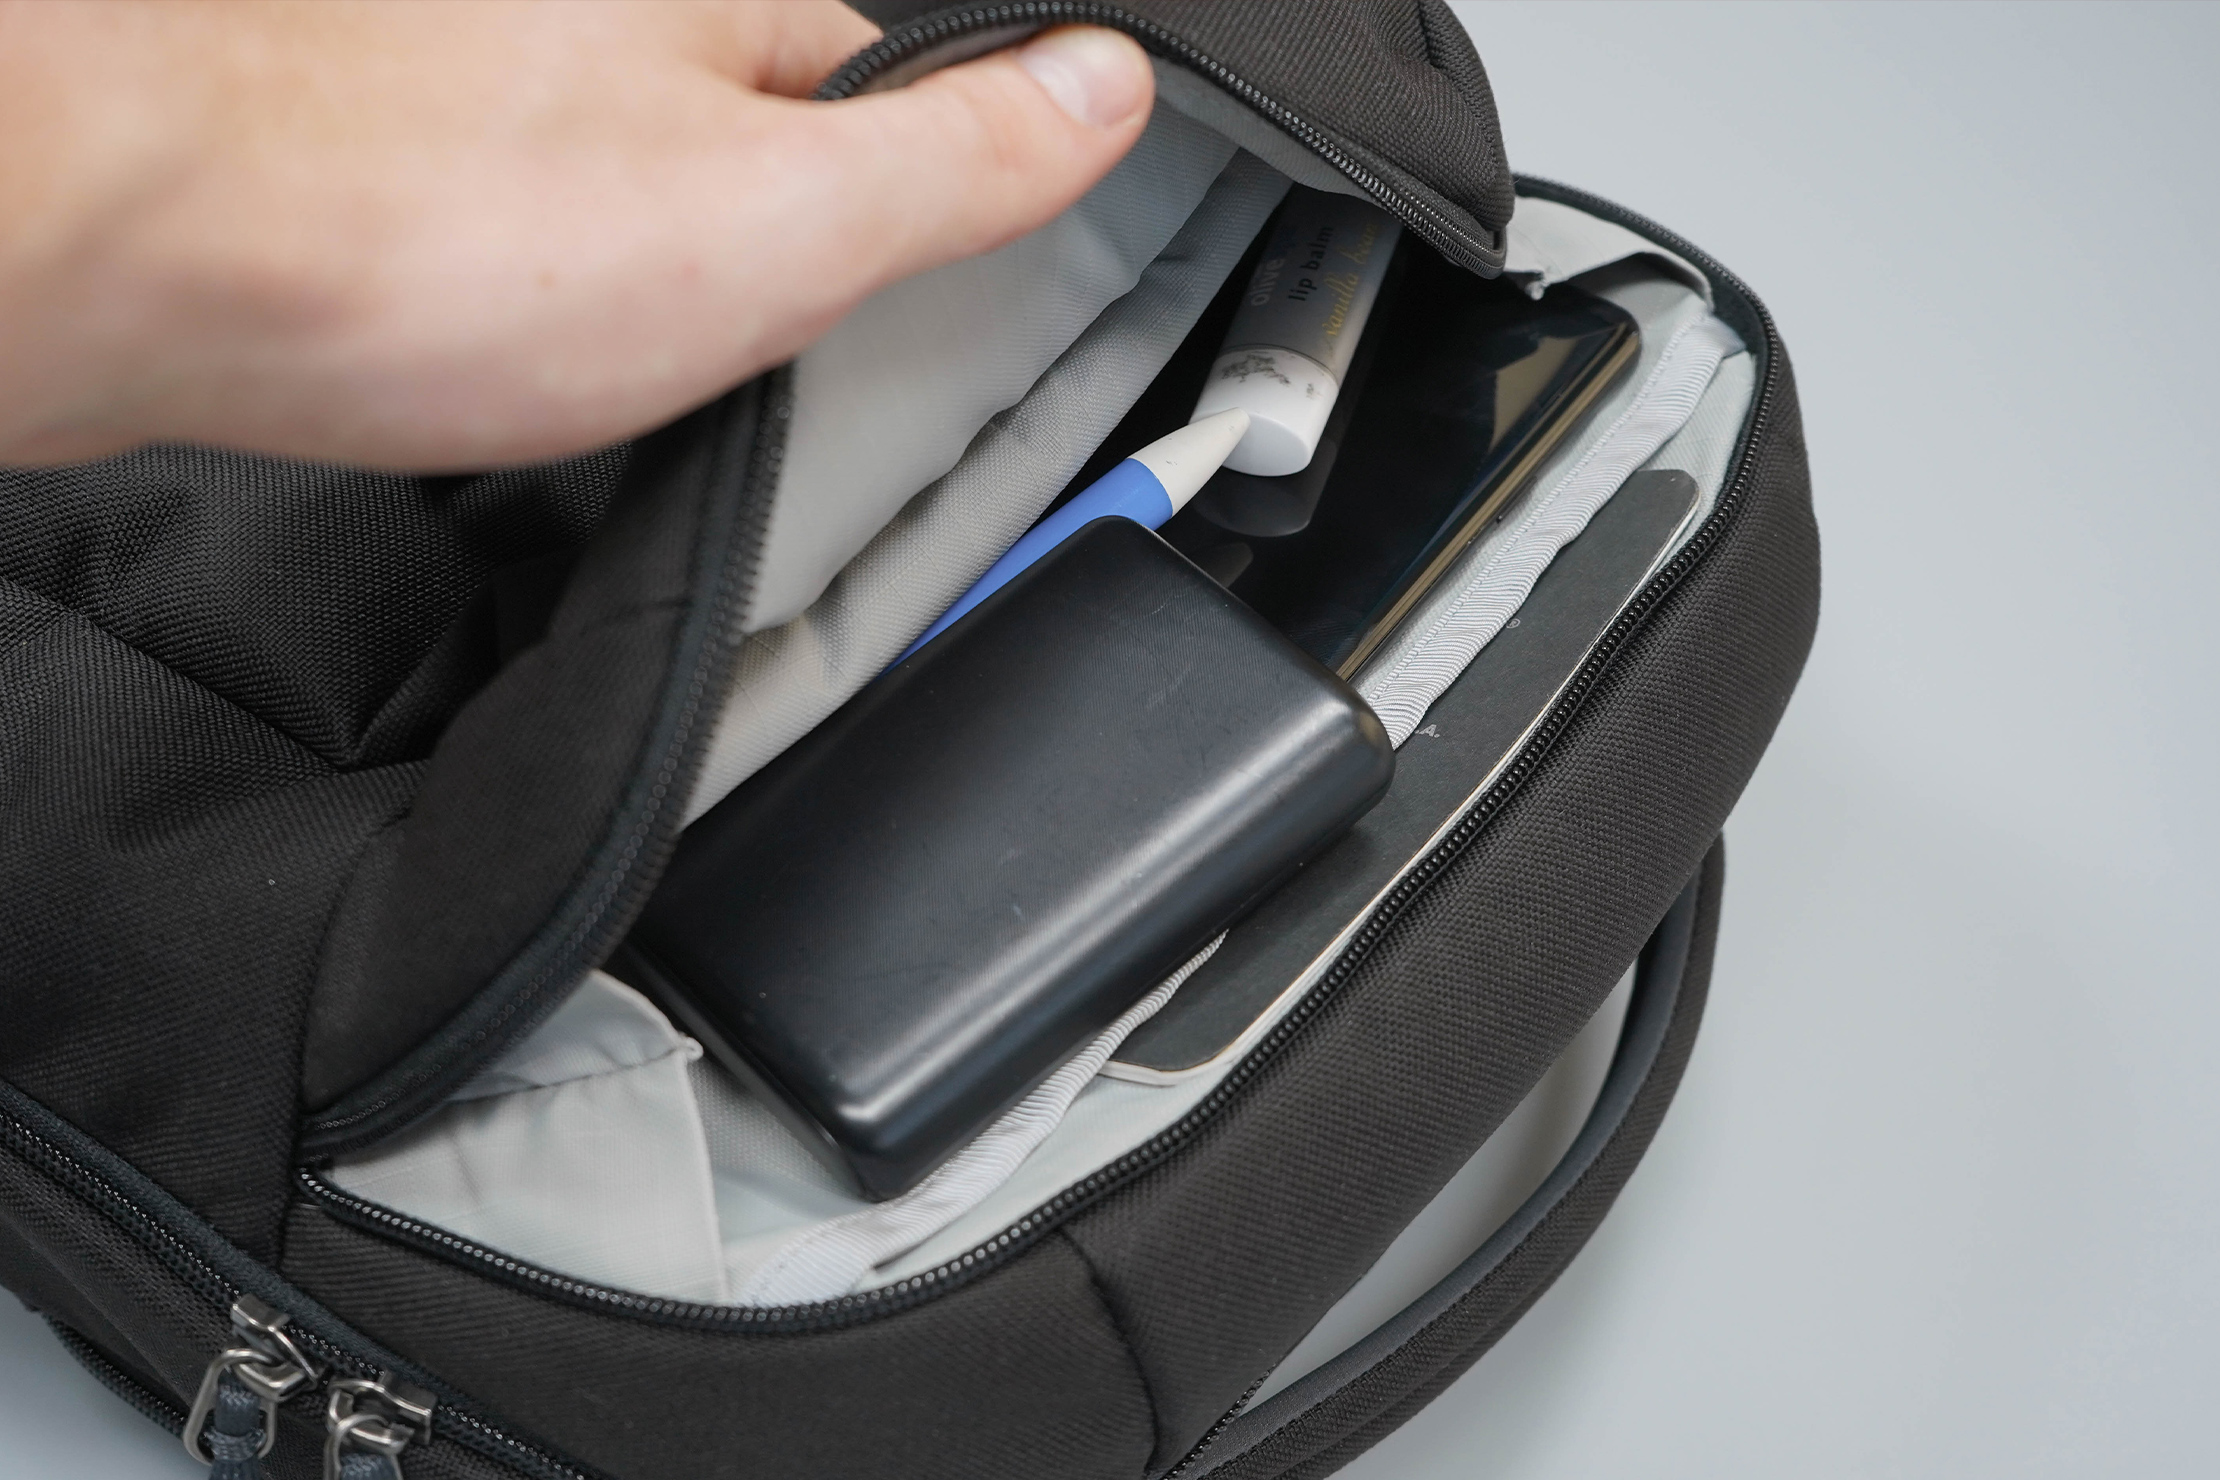 YETI Crossroads Backpack 23 Quick-Grab Pocket Full